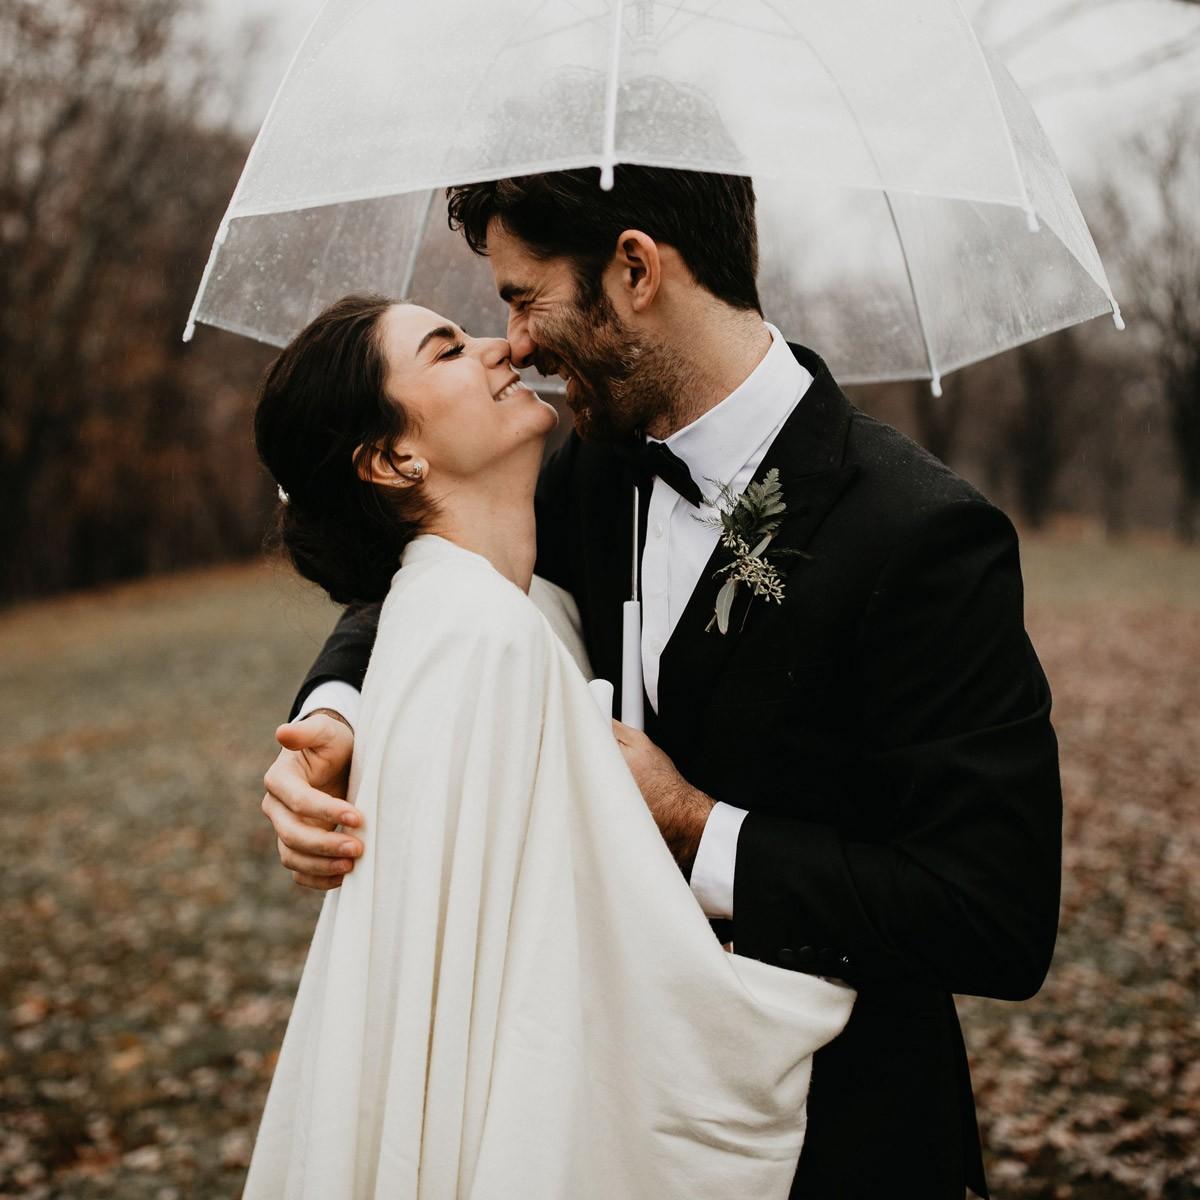 3a6ad04f496a3c Манікюр нюд для бездоганного образу нареченої - Hot Wedding